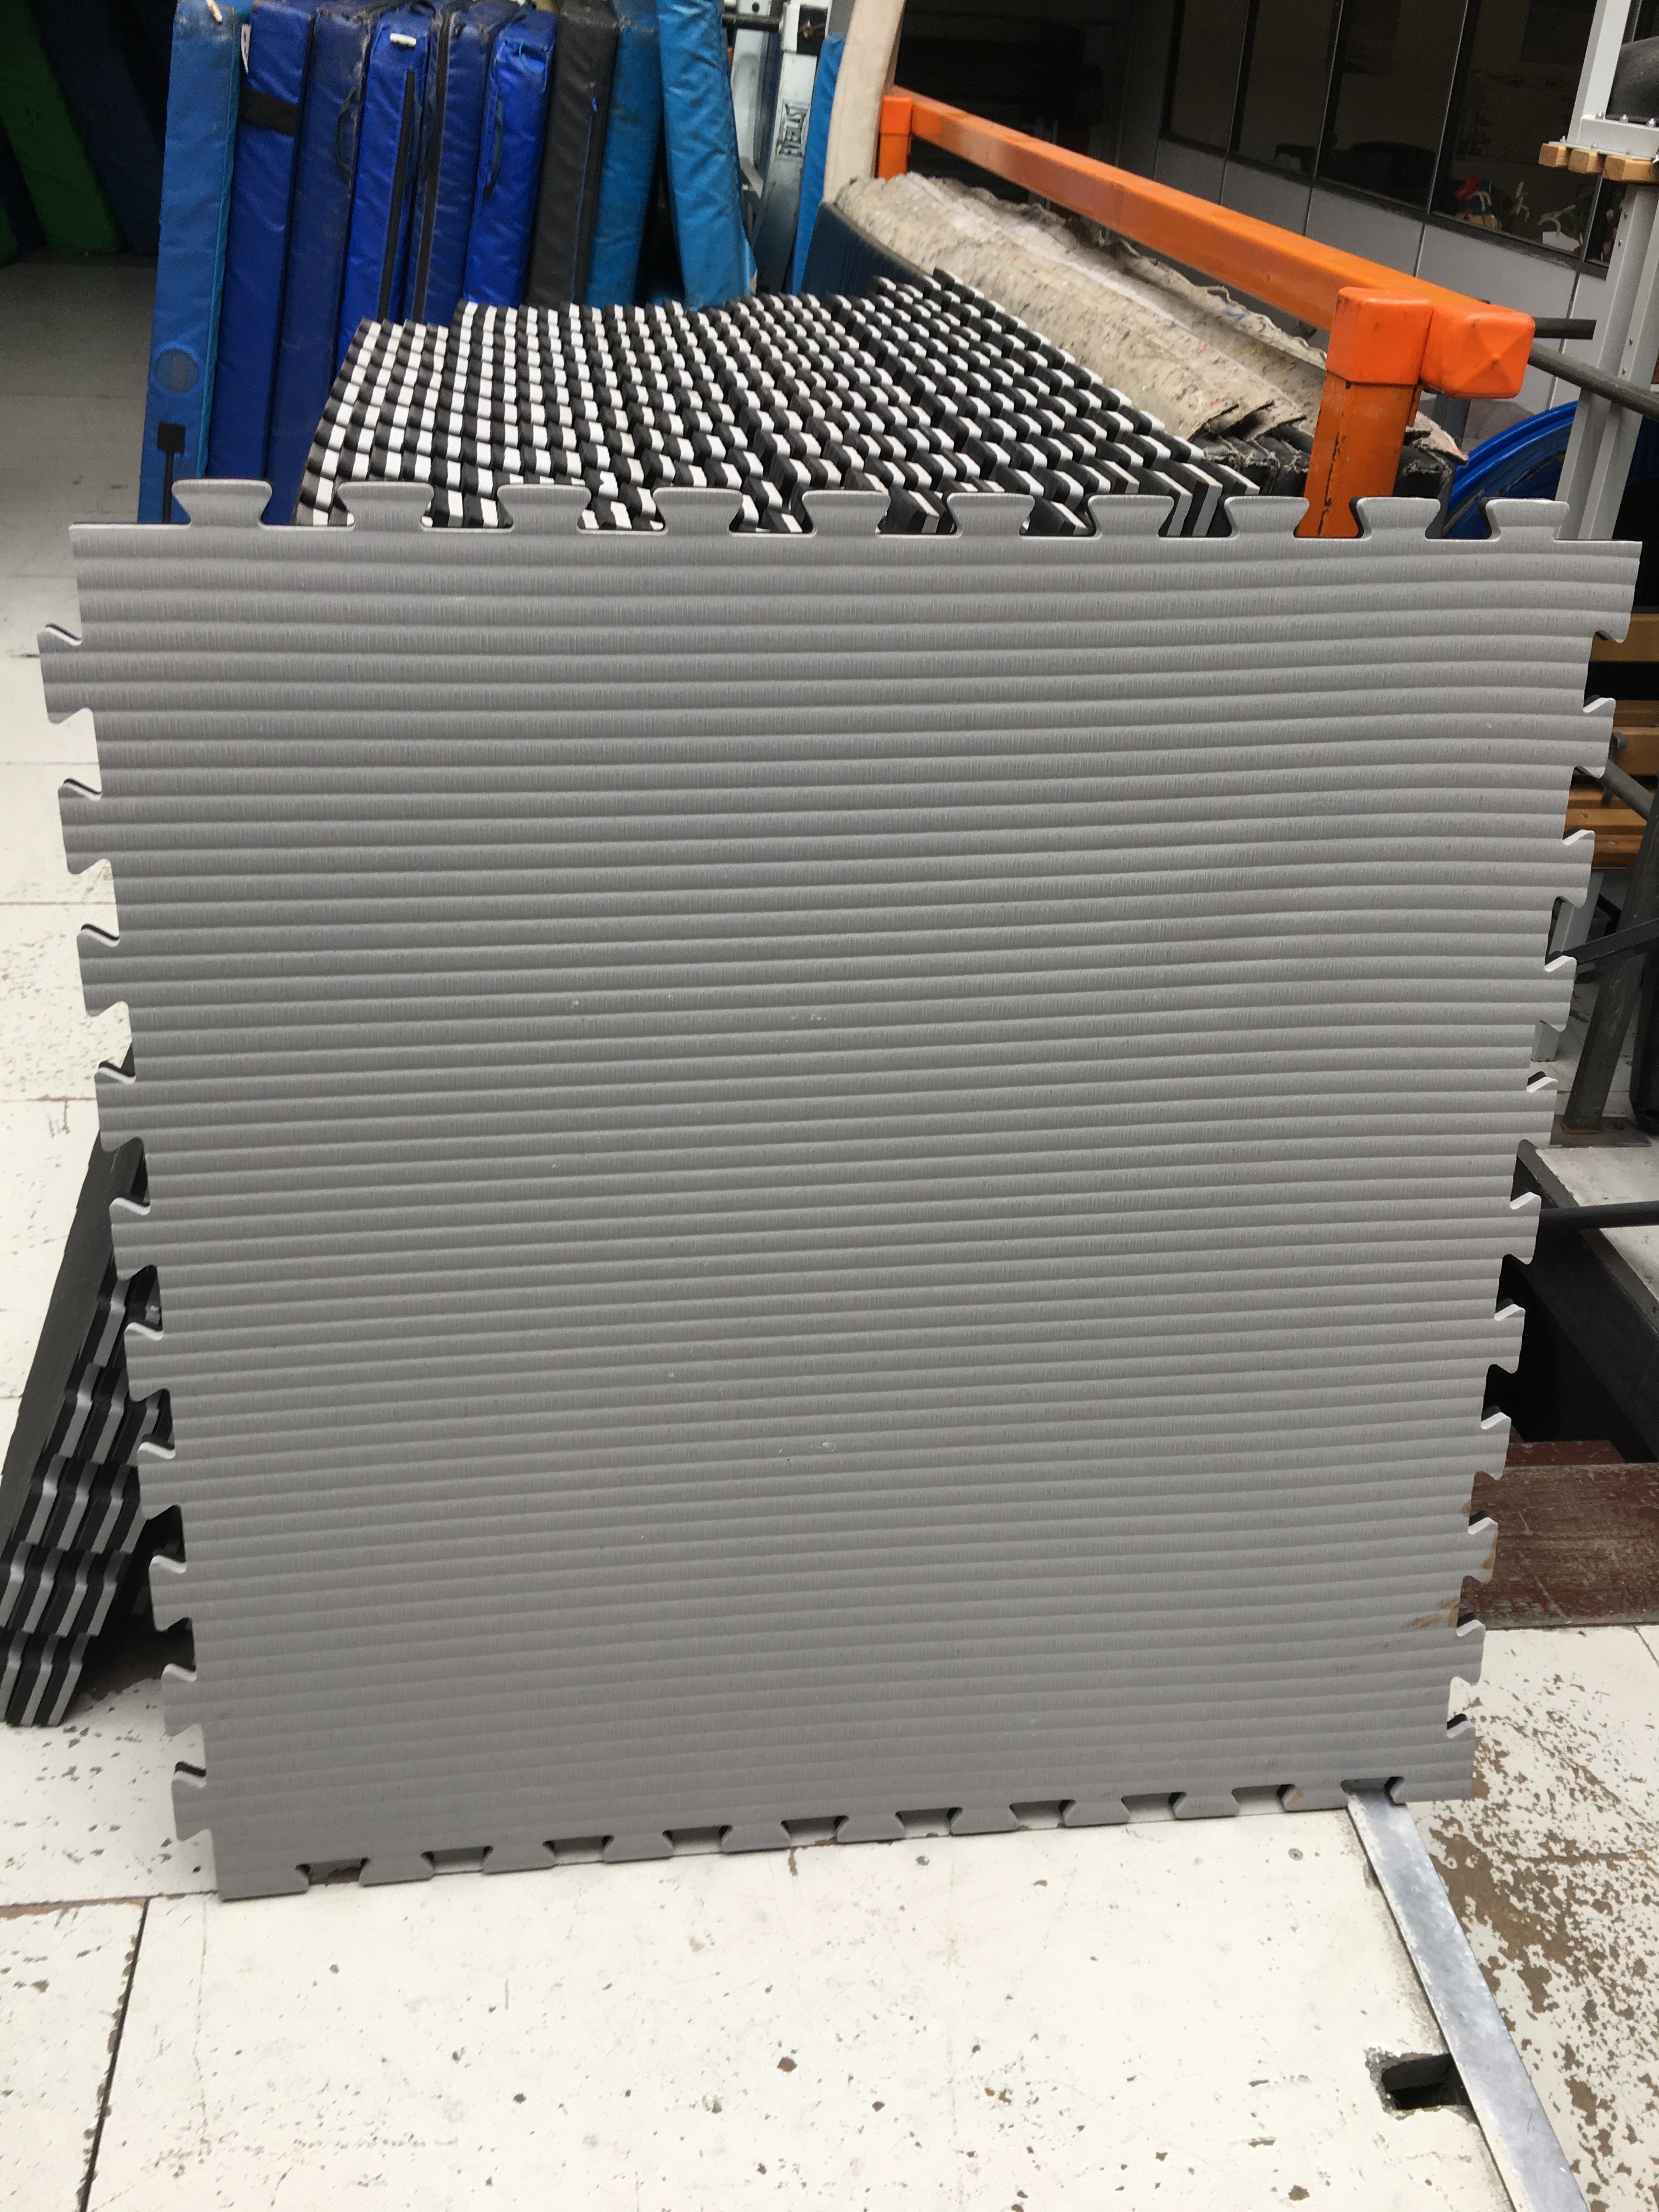 dsc large home gym product mat garage interlocking foam floor exercise fatigue anti eva mats